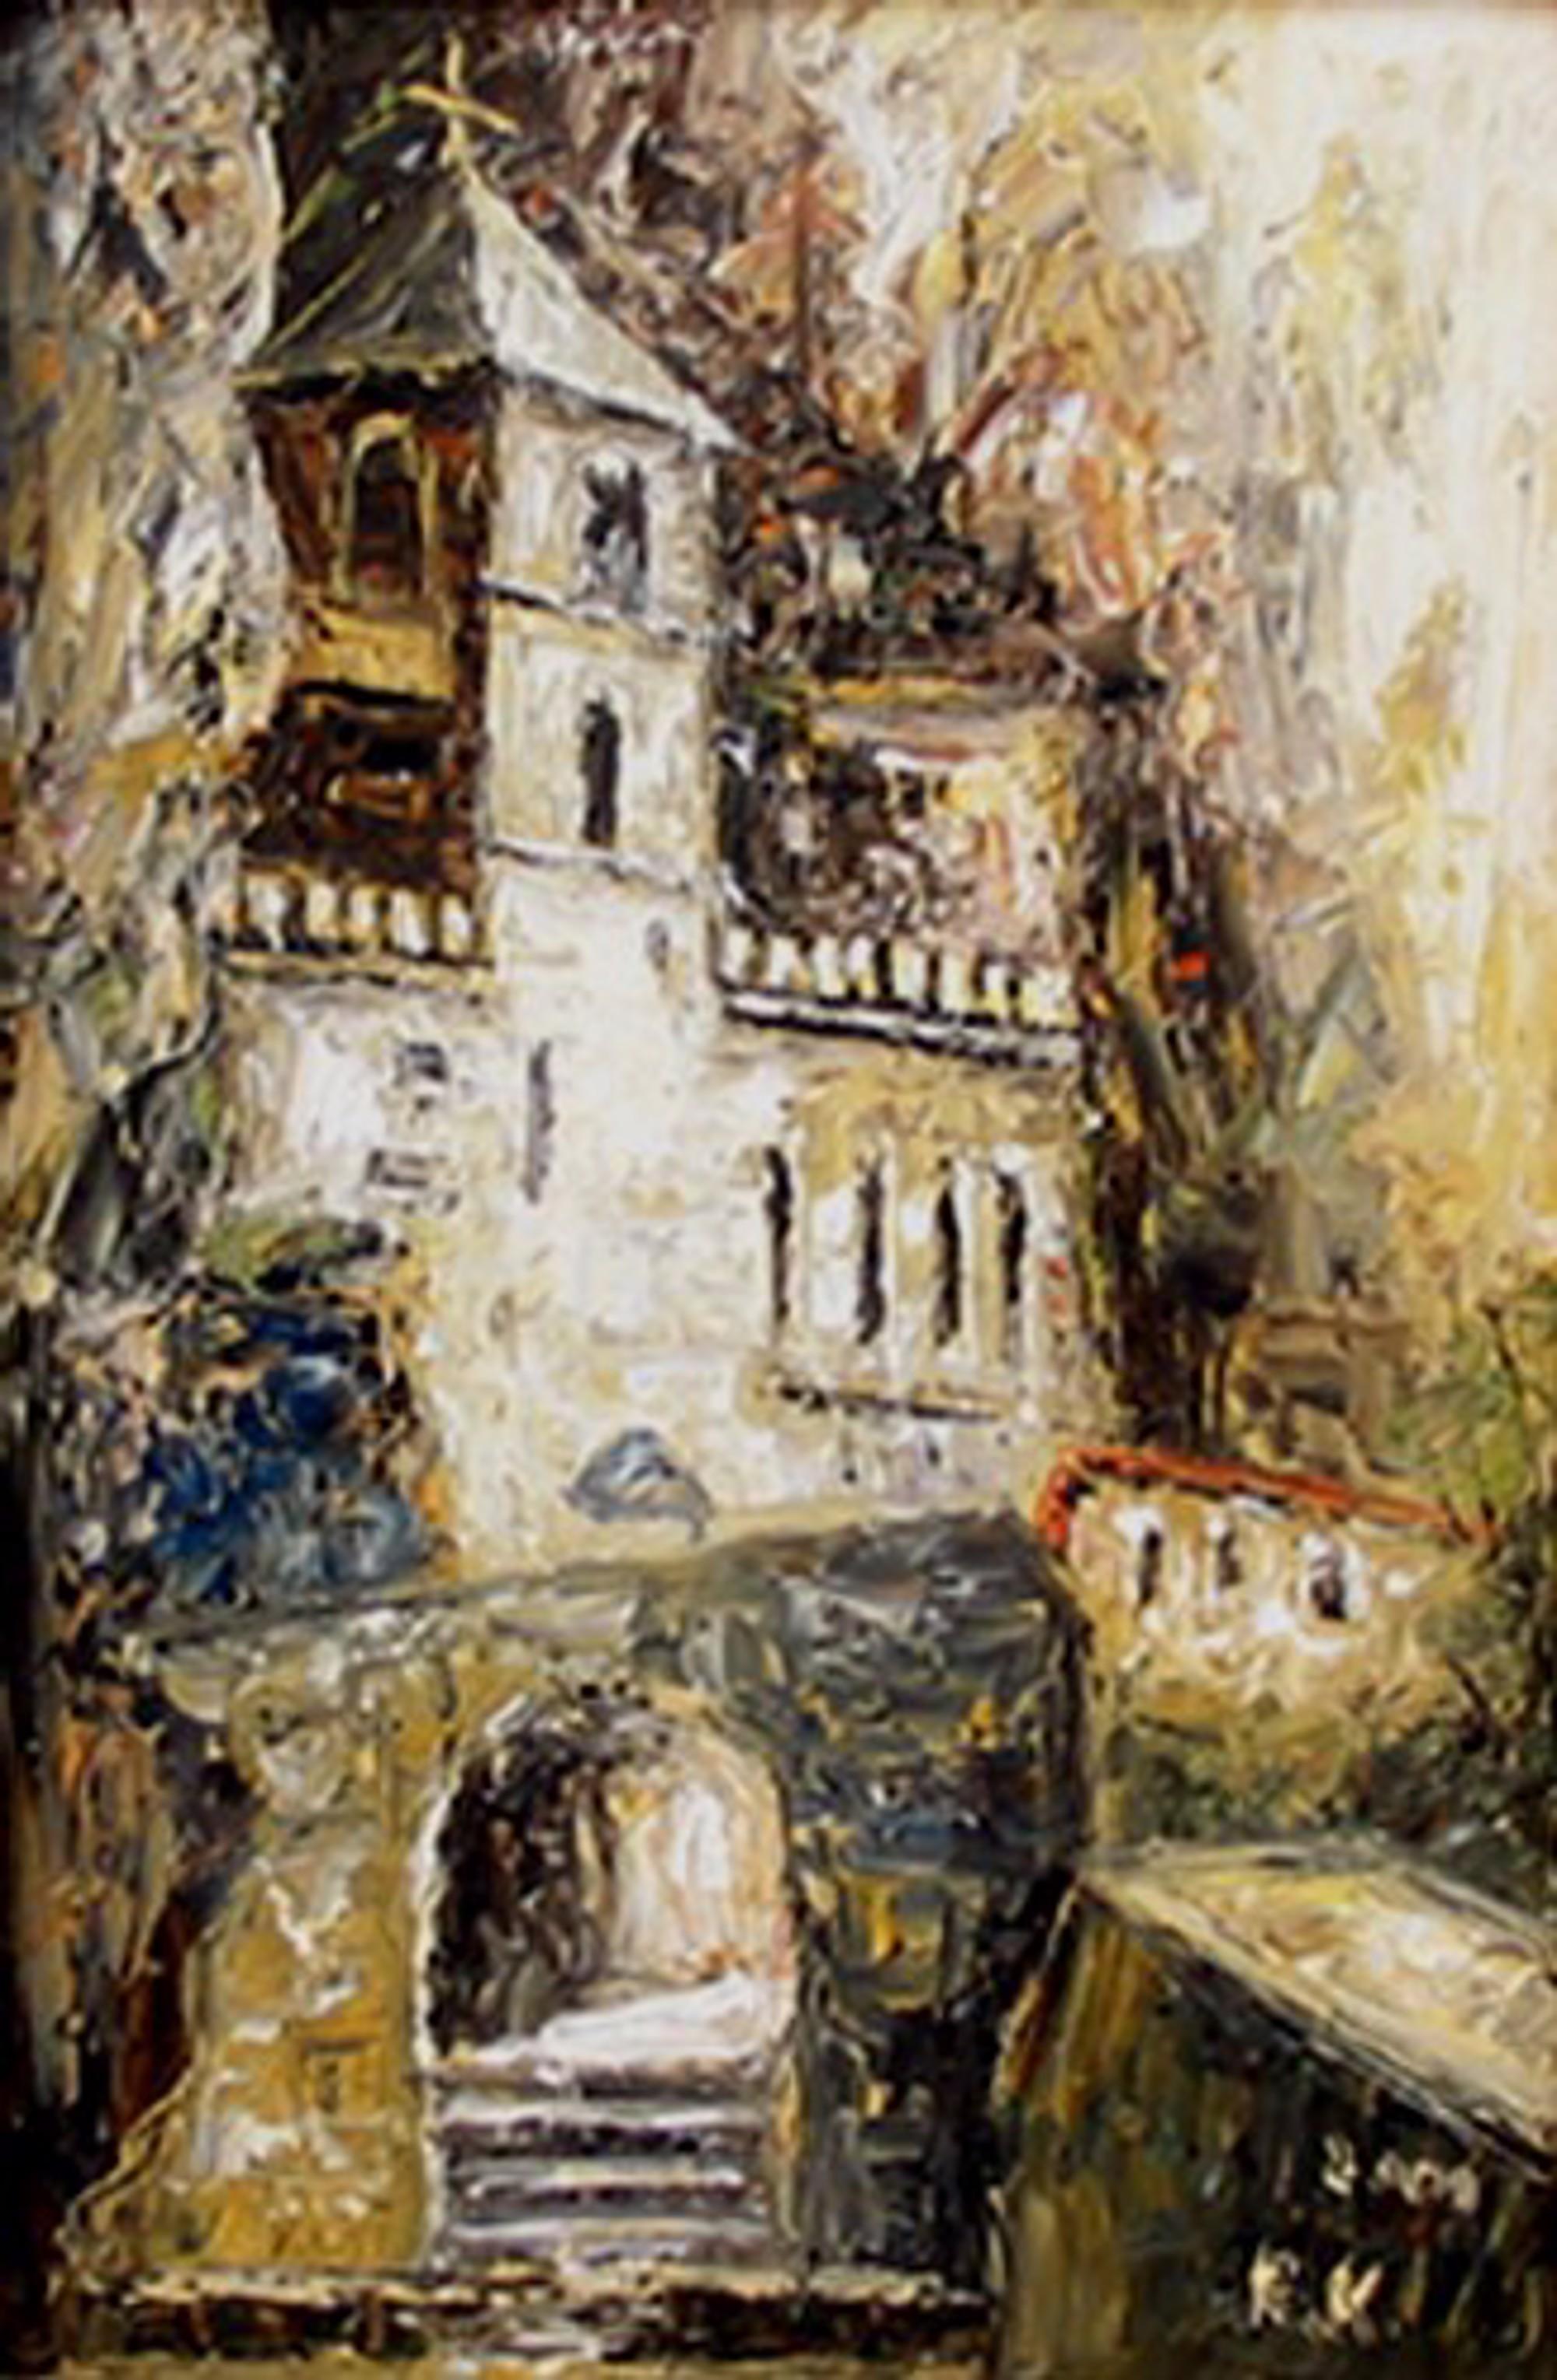 OSTROG by KIPERAS